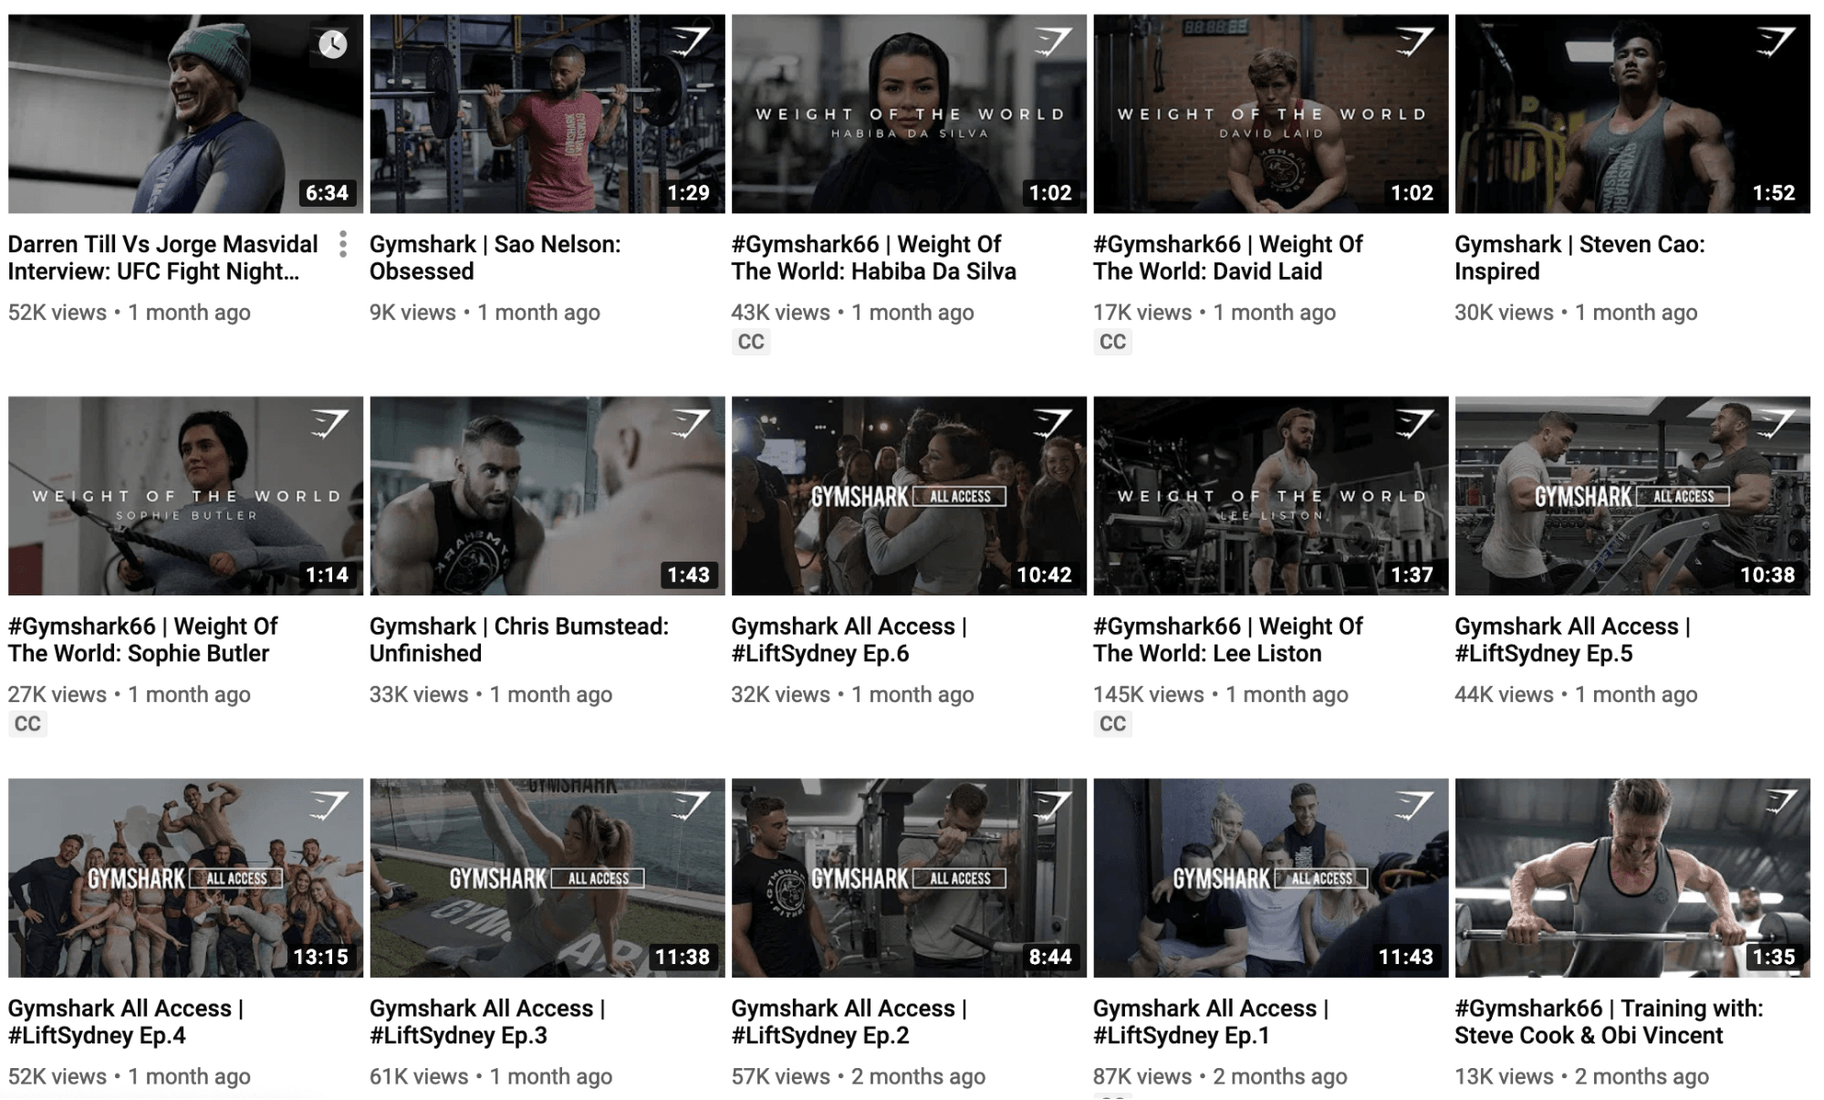 Gymshark Thumbnail on YouTube